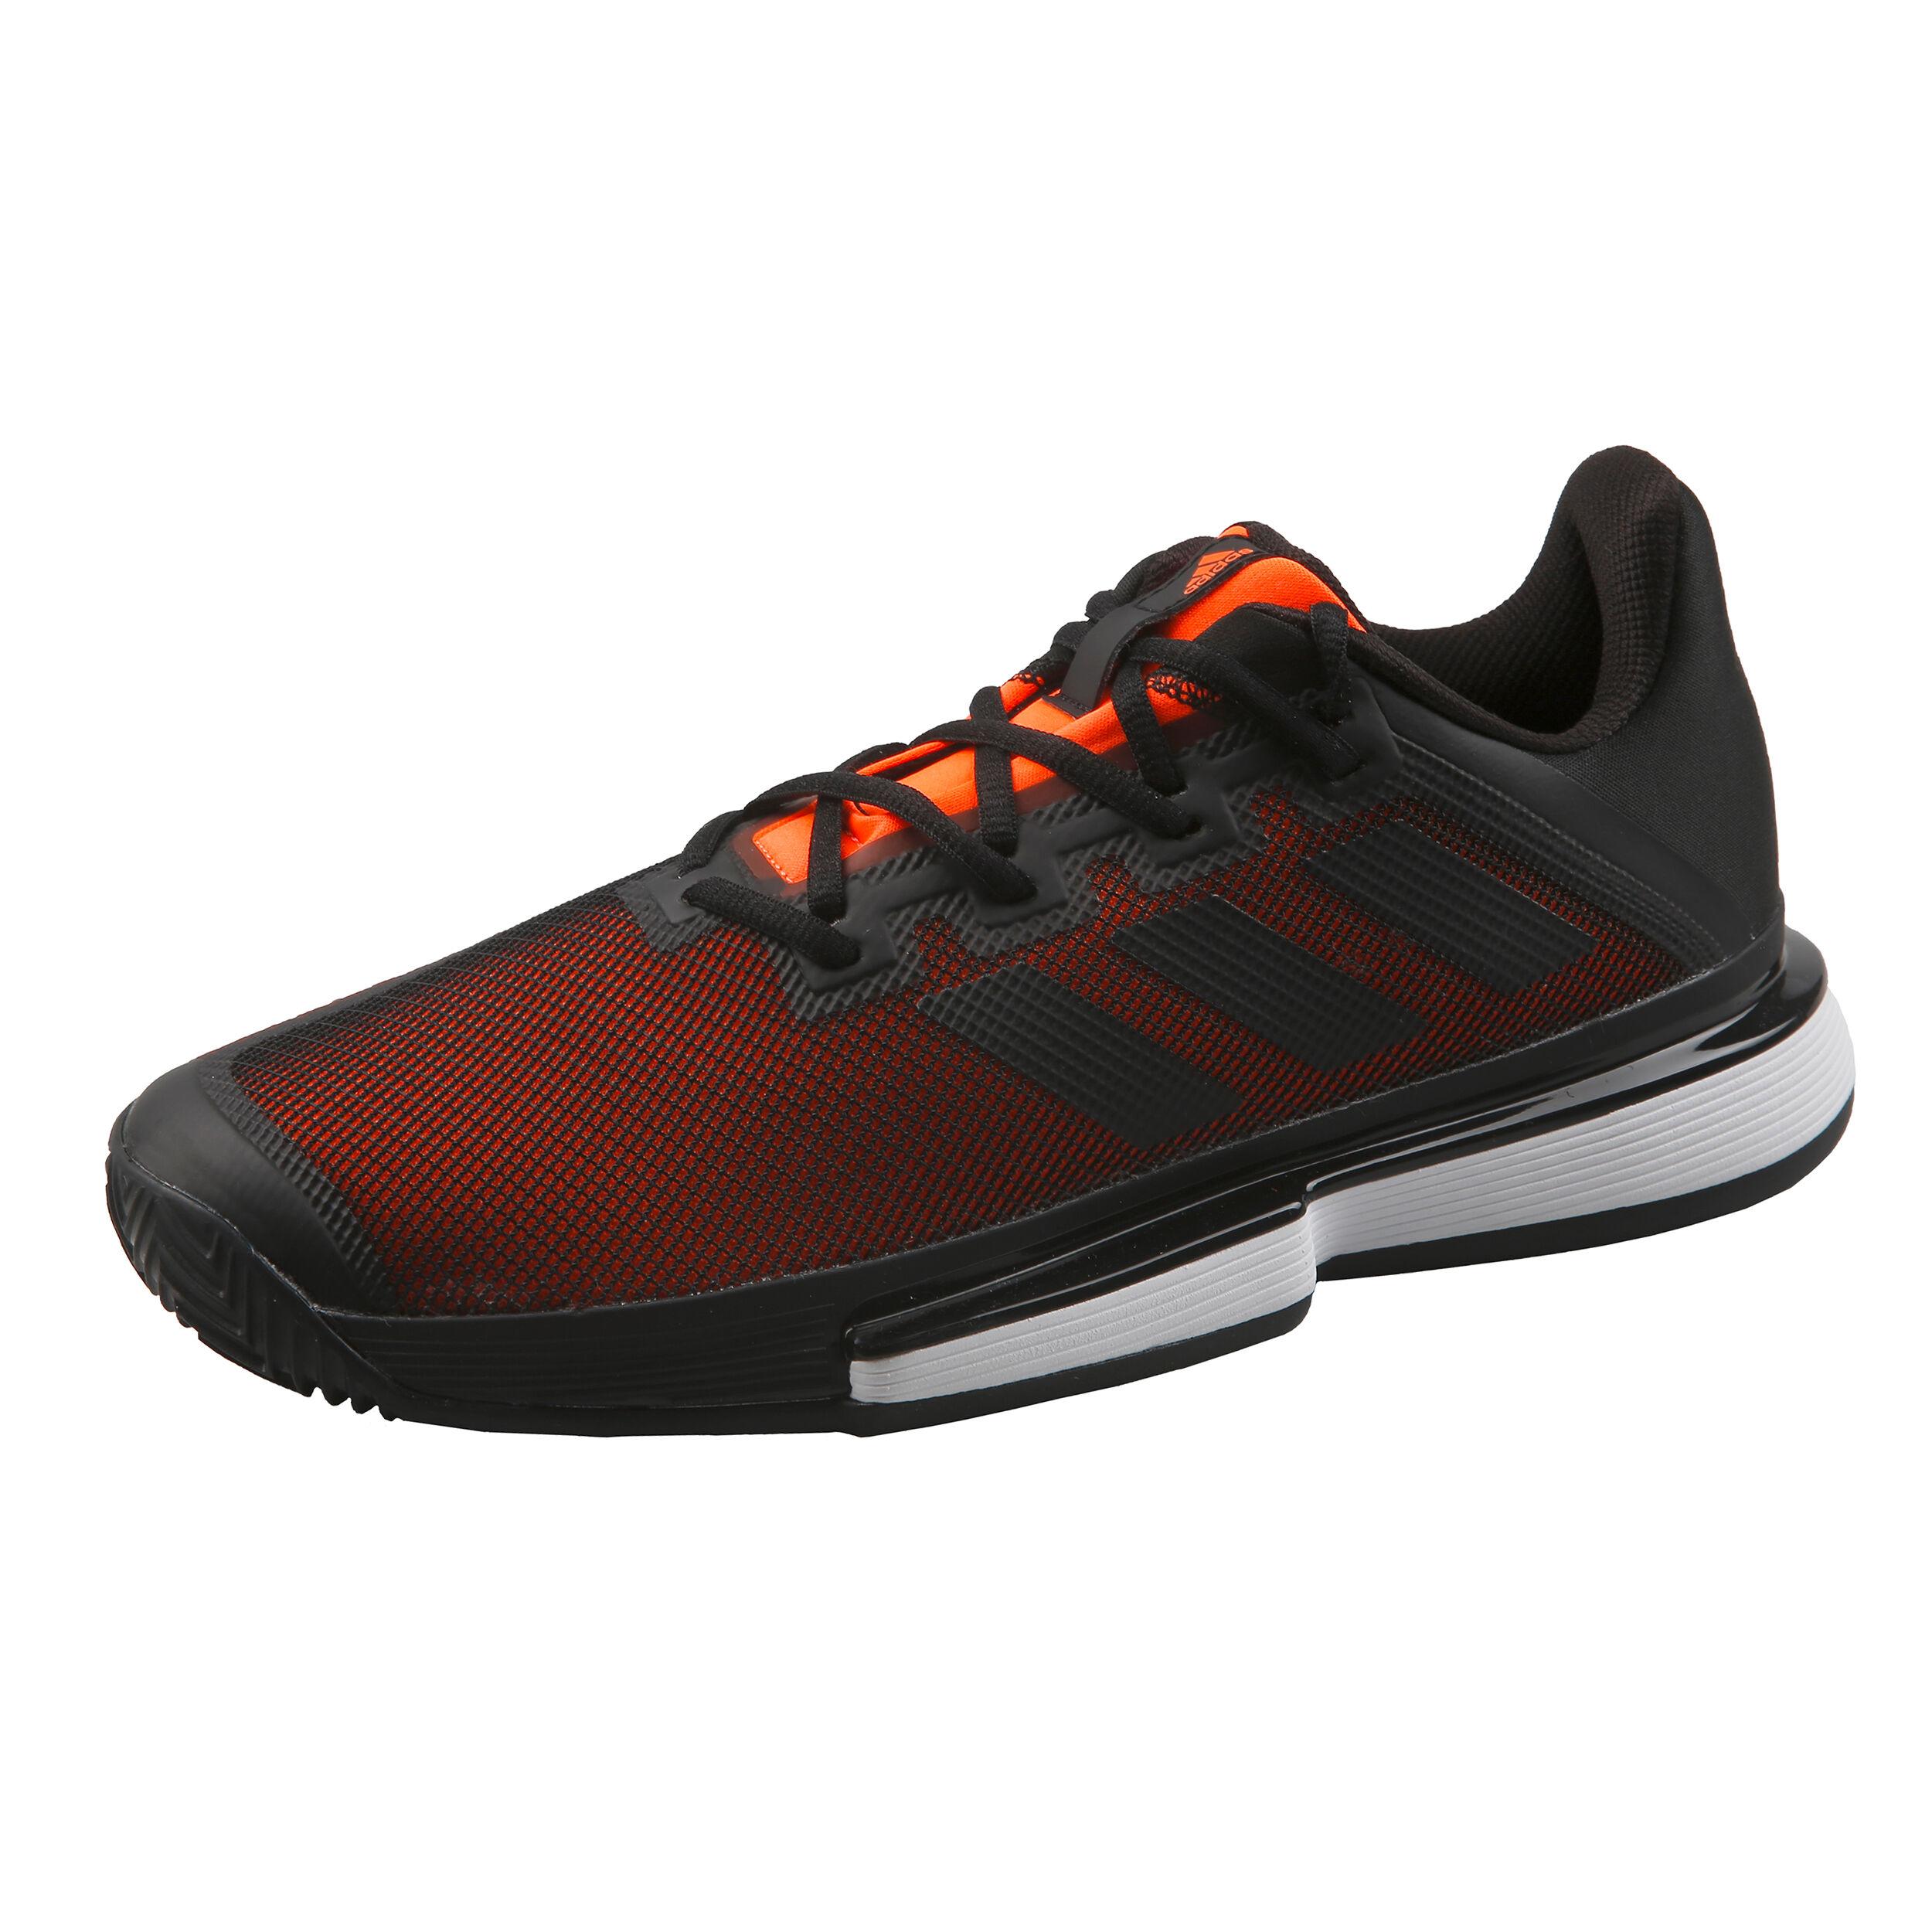 Adidas SoleMatch Bounce Clay Chaussure tennis Homme Noir et orange